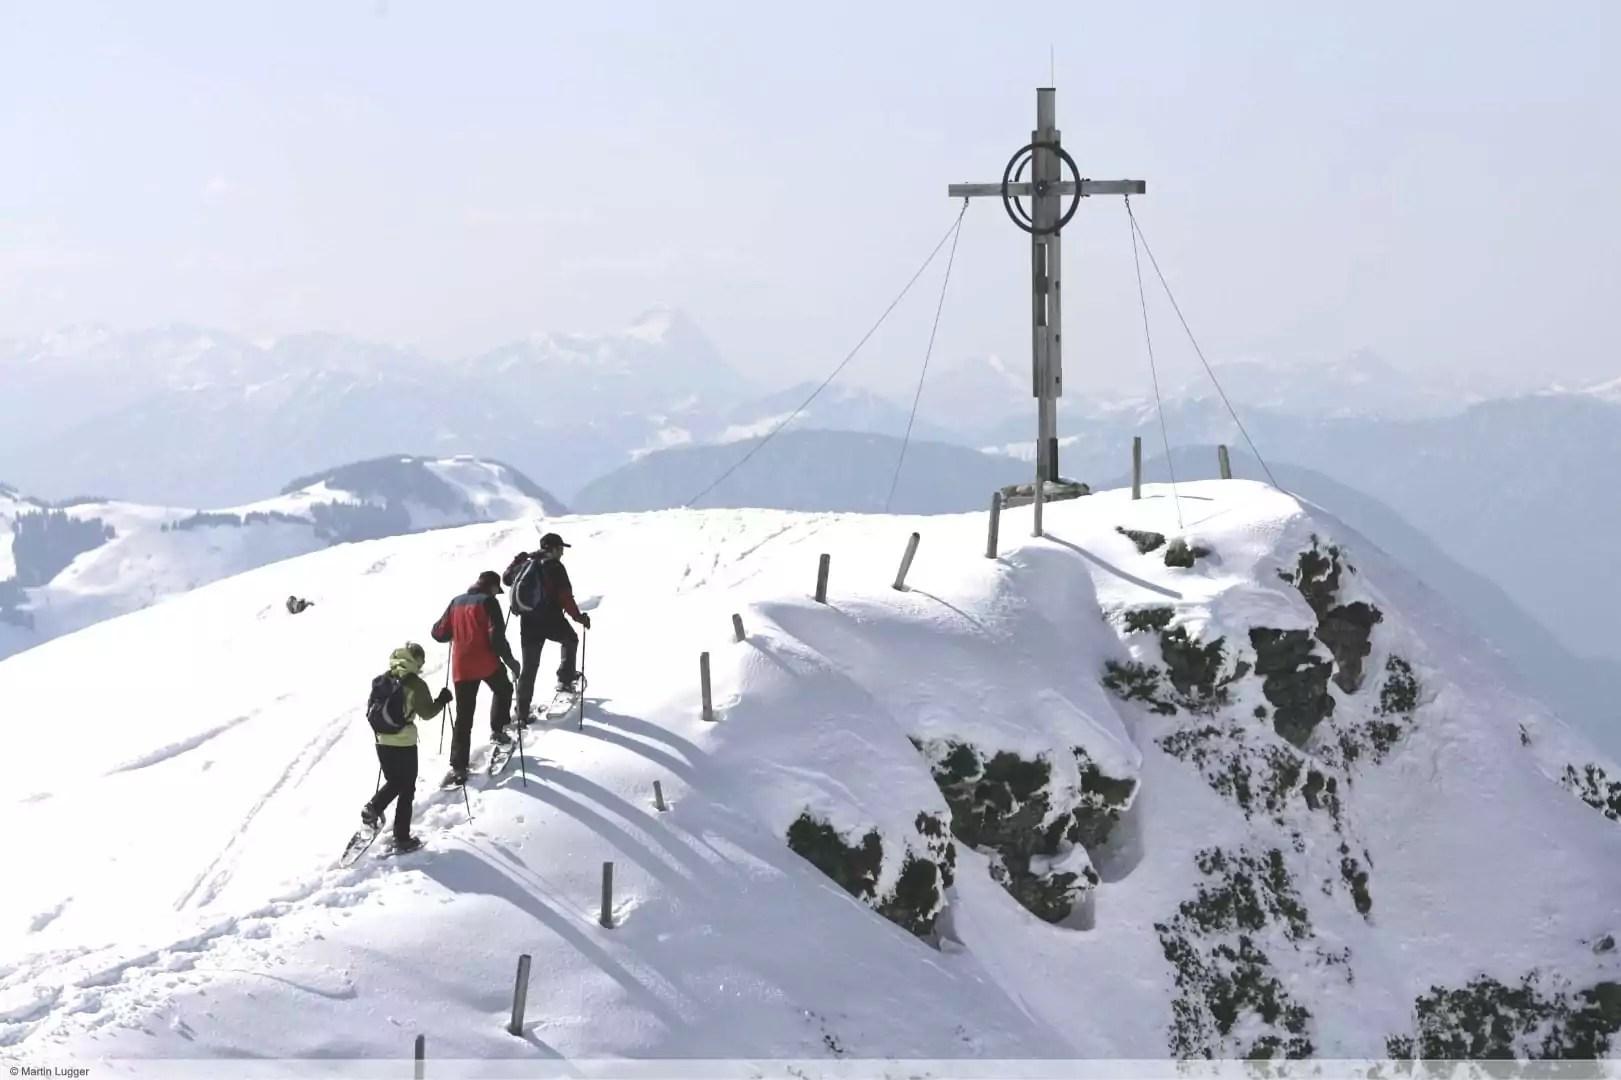 après-ski in Pass Thurn